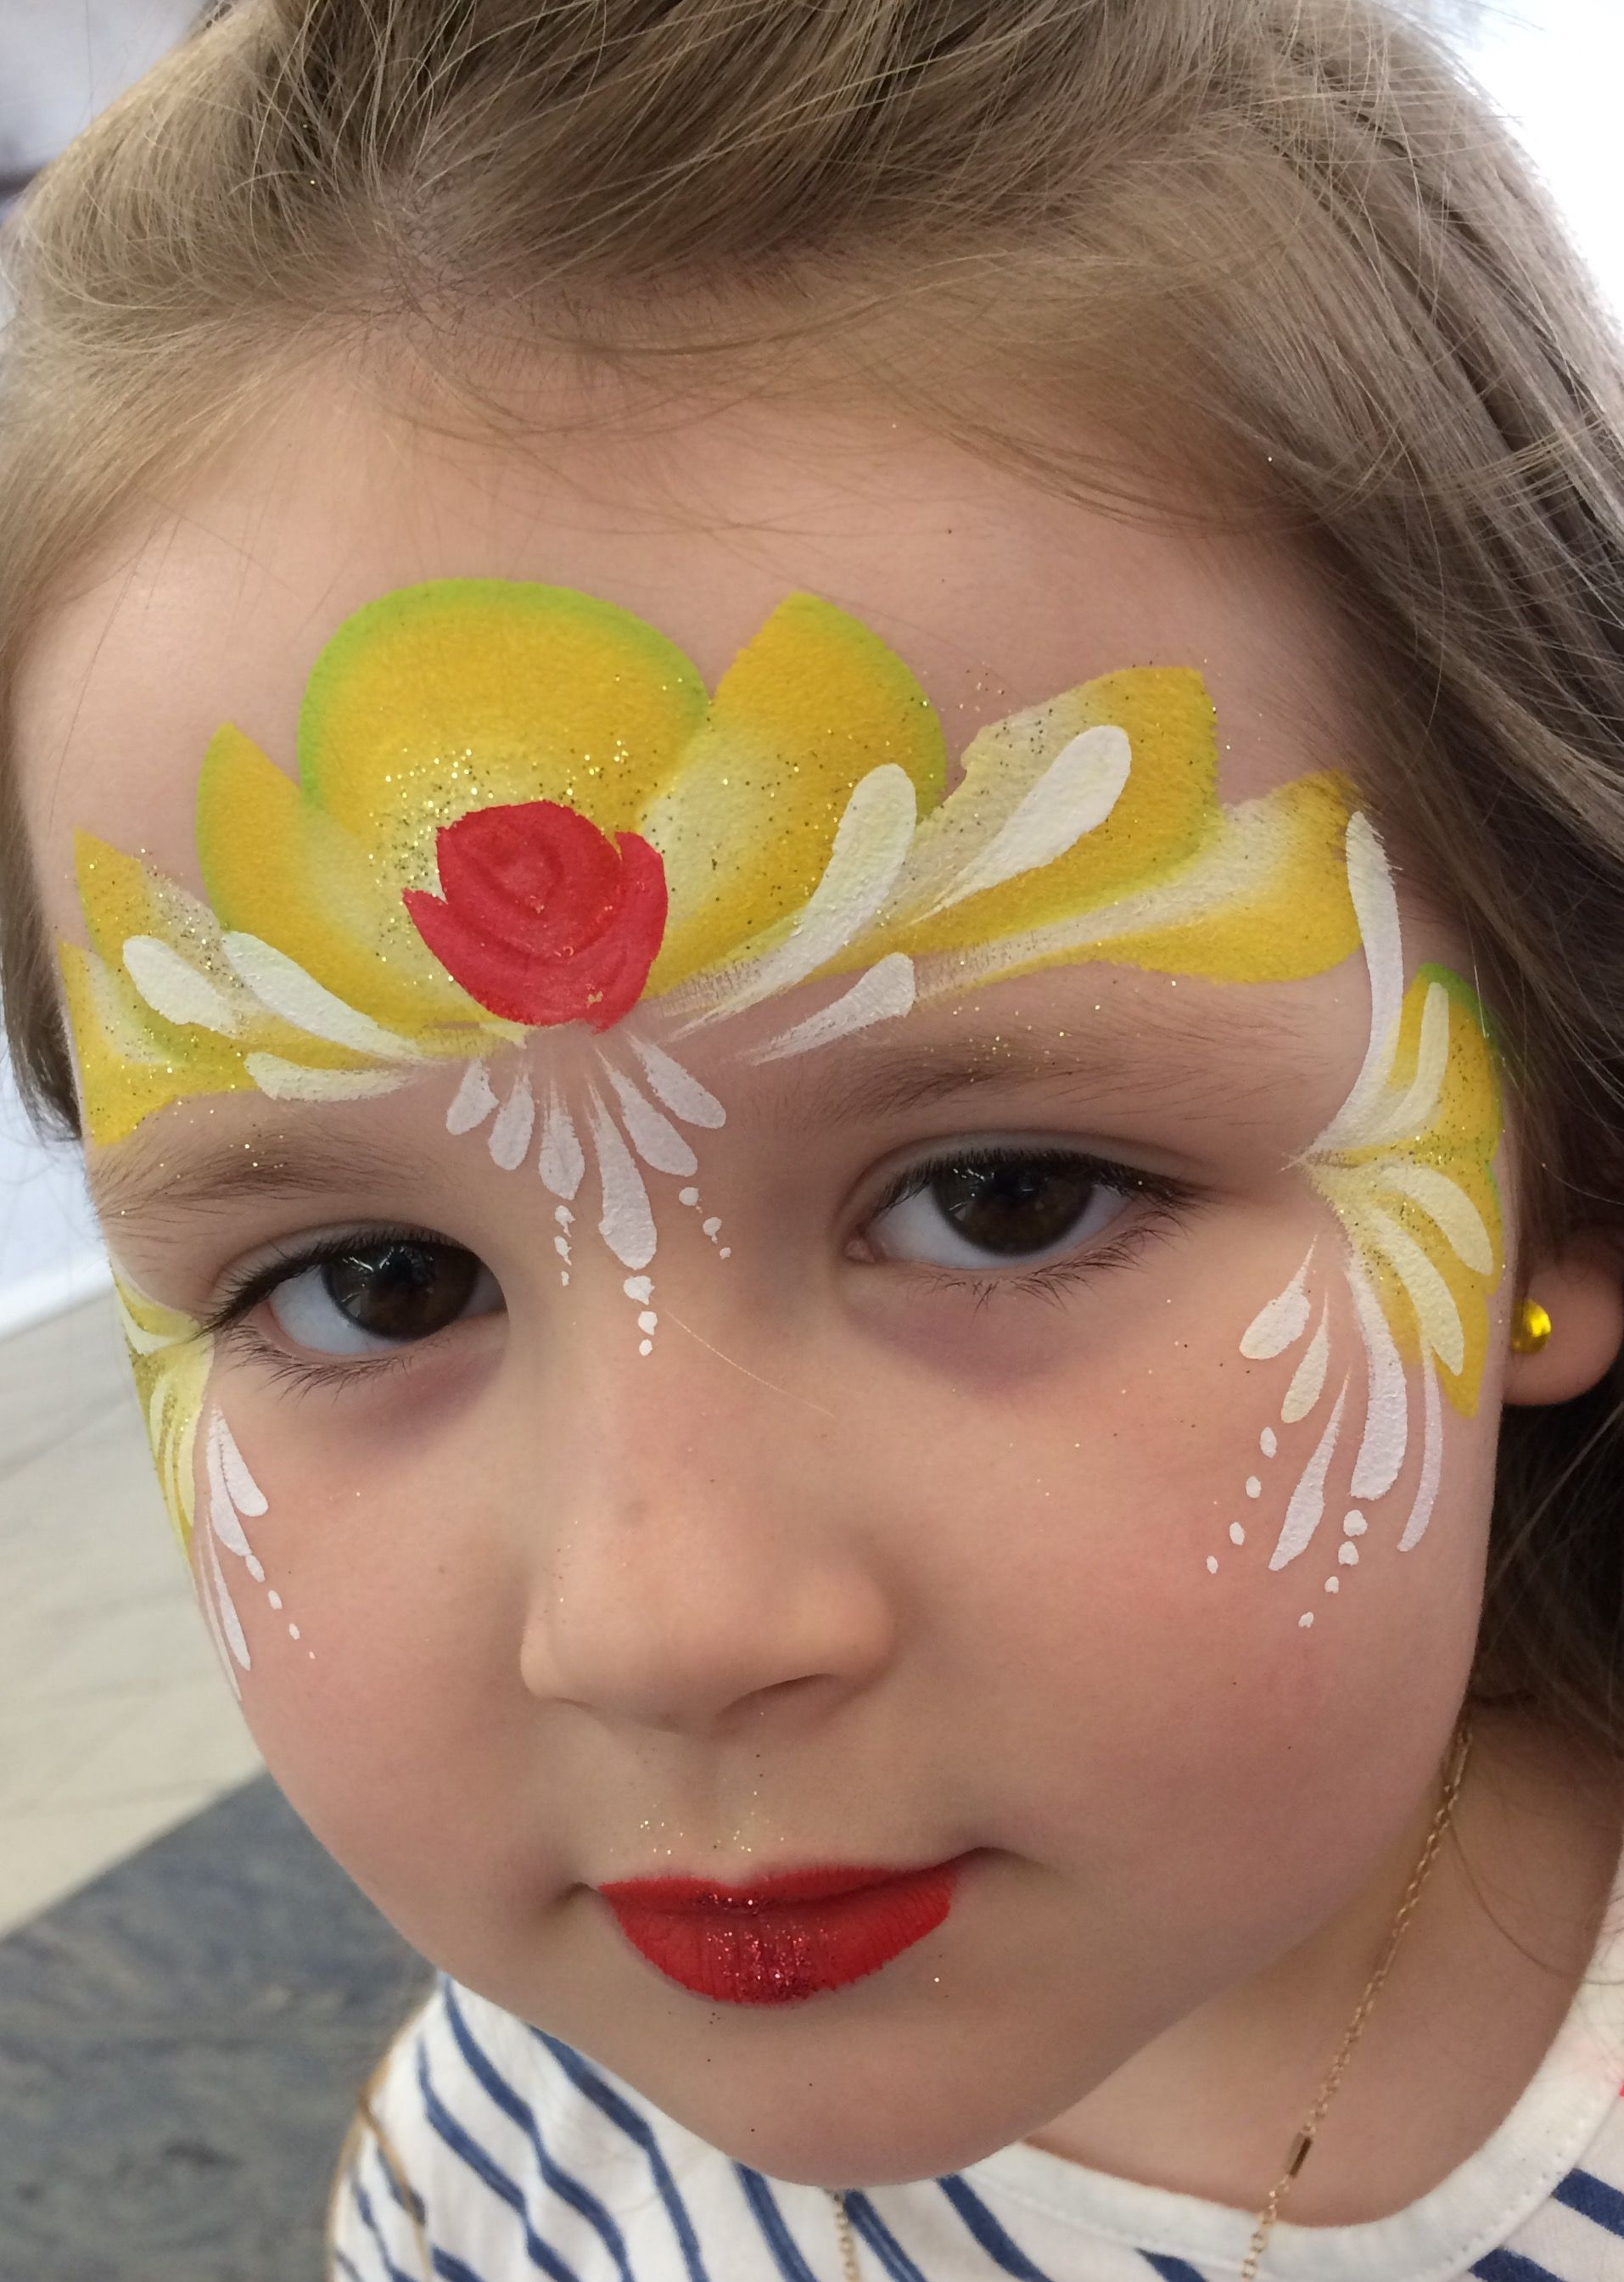 Beauty And The Beast Crown Yellow Red Disney Schminke Gesichtsbemalung Prinzessin Kinder Schminken Prinzessin